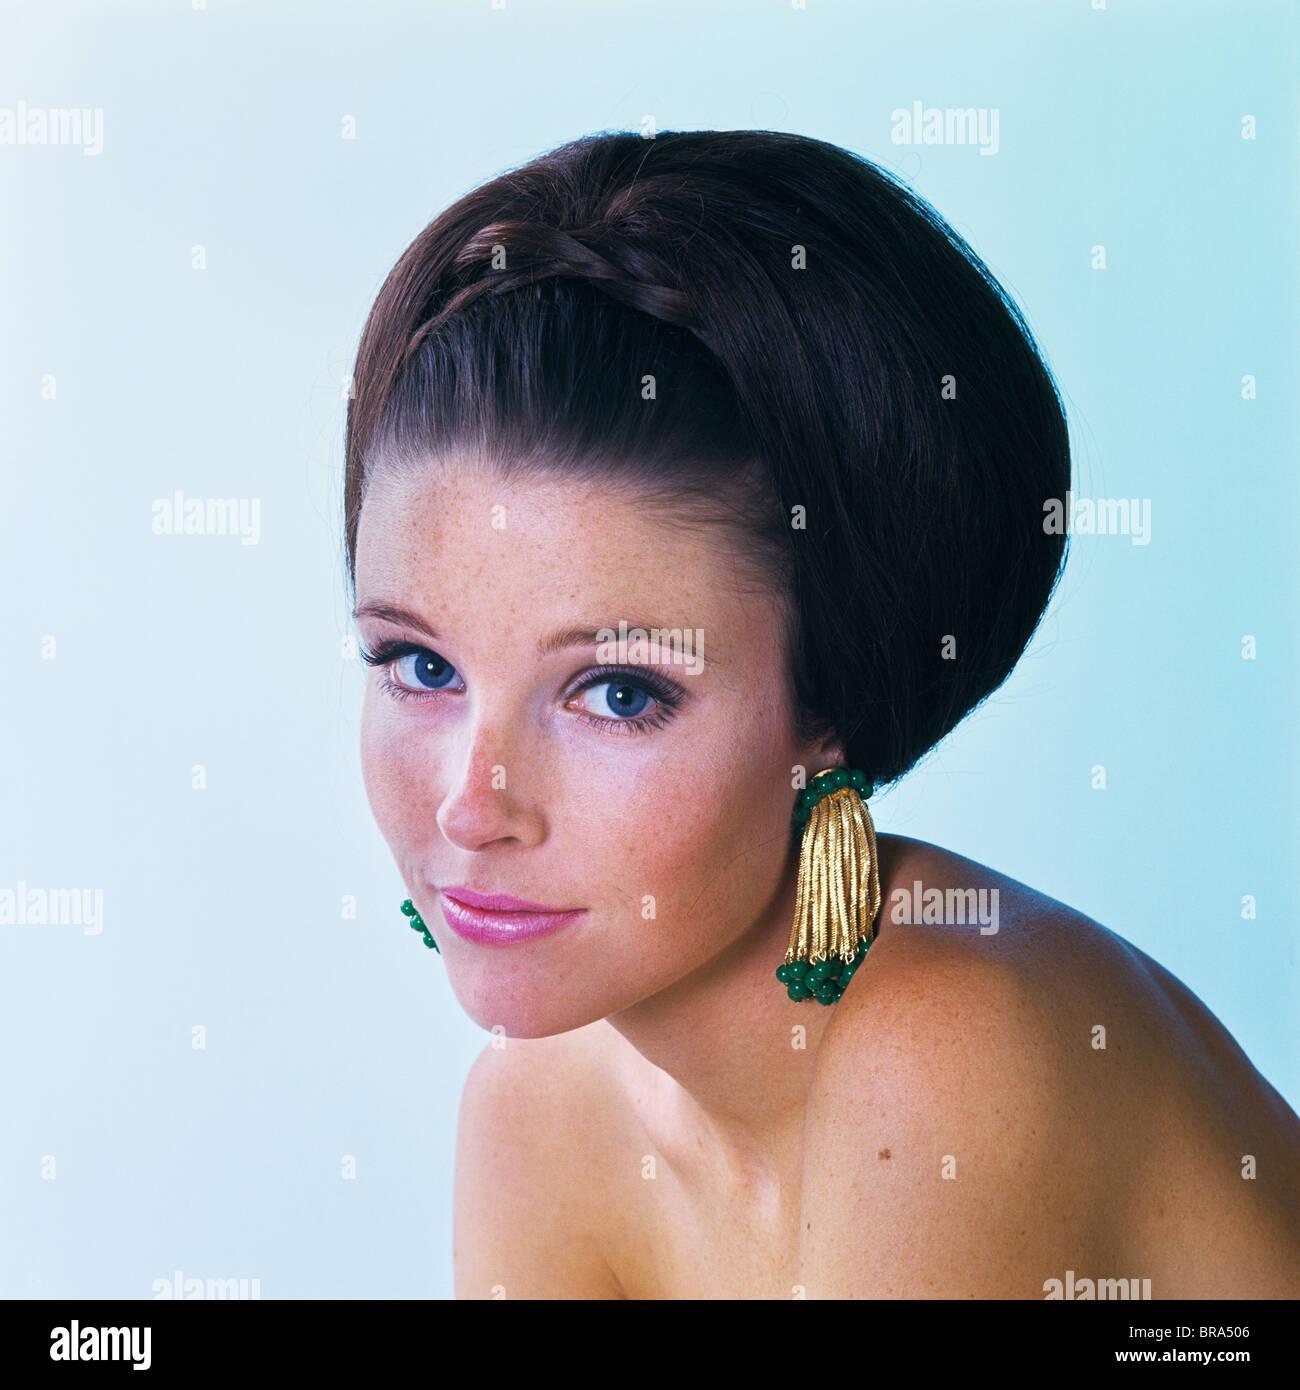 1960er Jahre Junge Frau Lächelnd Brünette Lange Haare Gehänselt